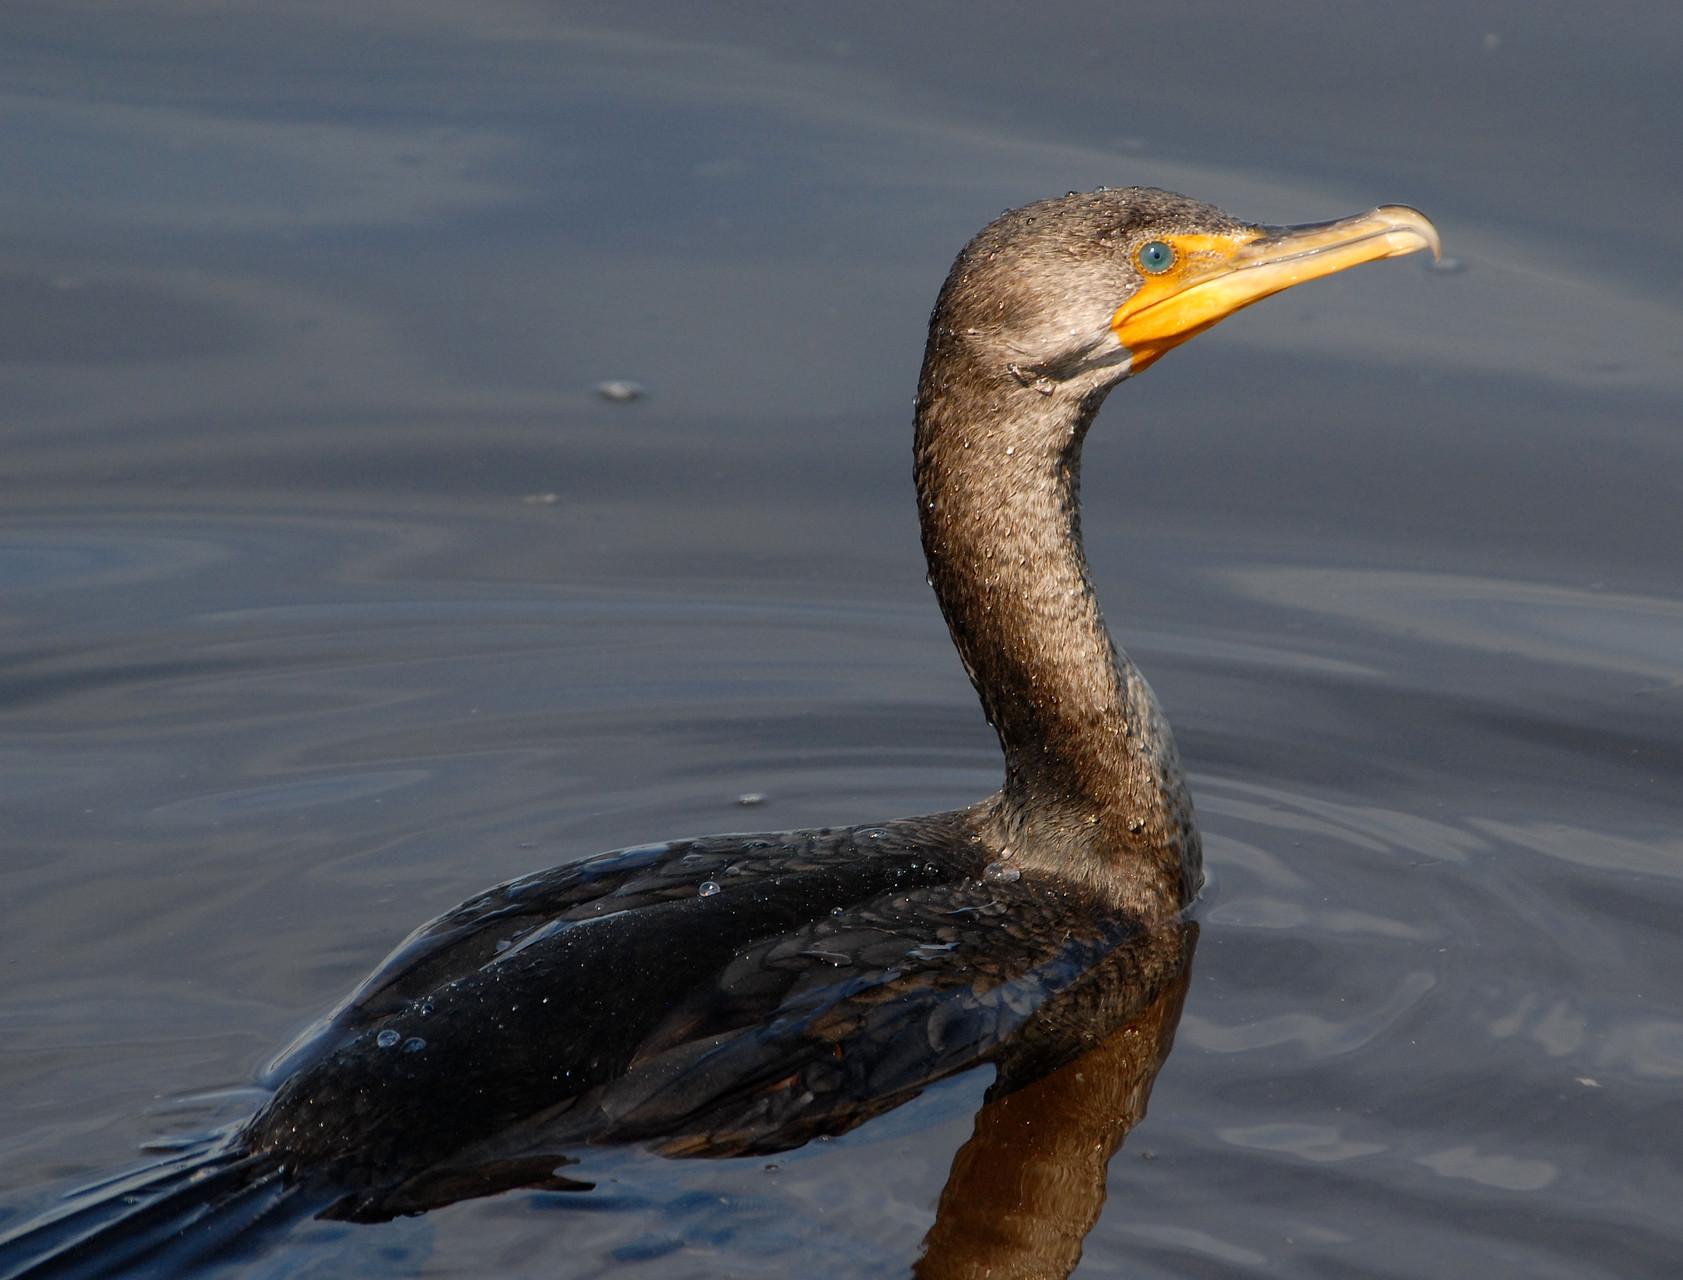 01_Kormoran (cormorant) in Fort Walton Beach in Florida